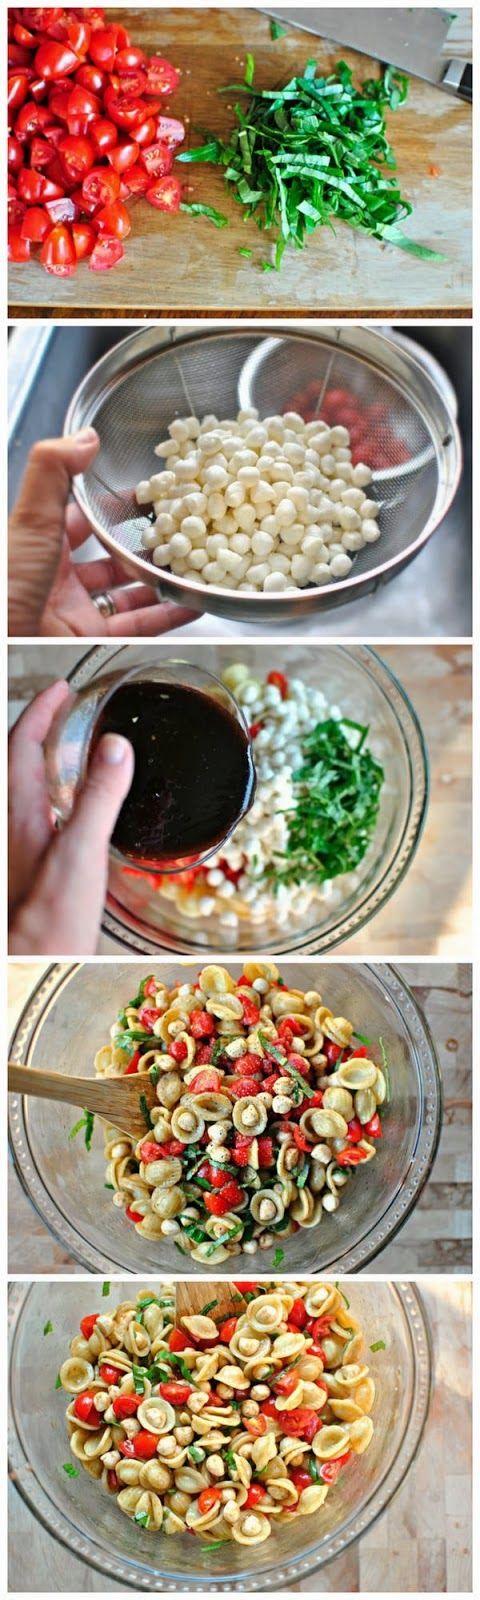 Caprese Pasta Salad - eatagreatdeal